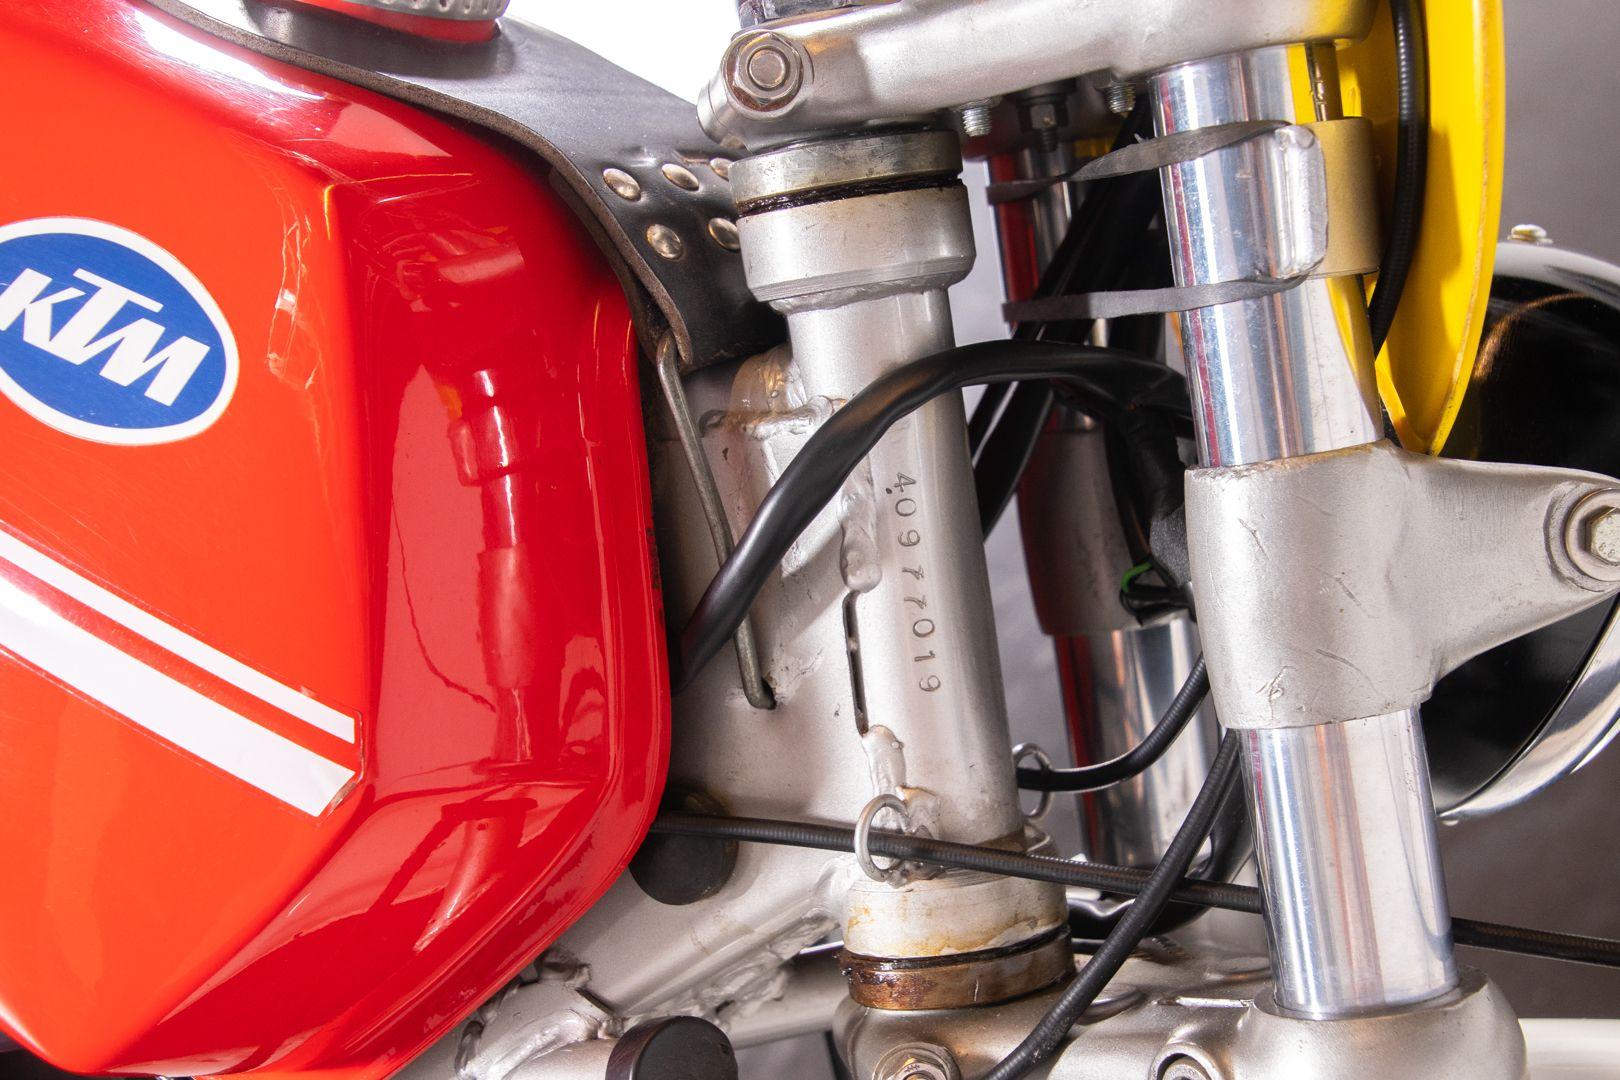 1974 KTM 125 GS 48756